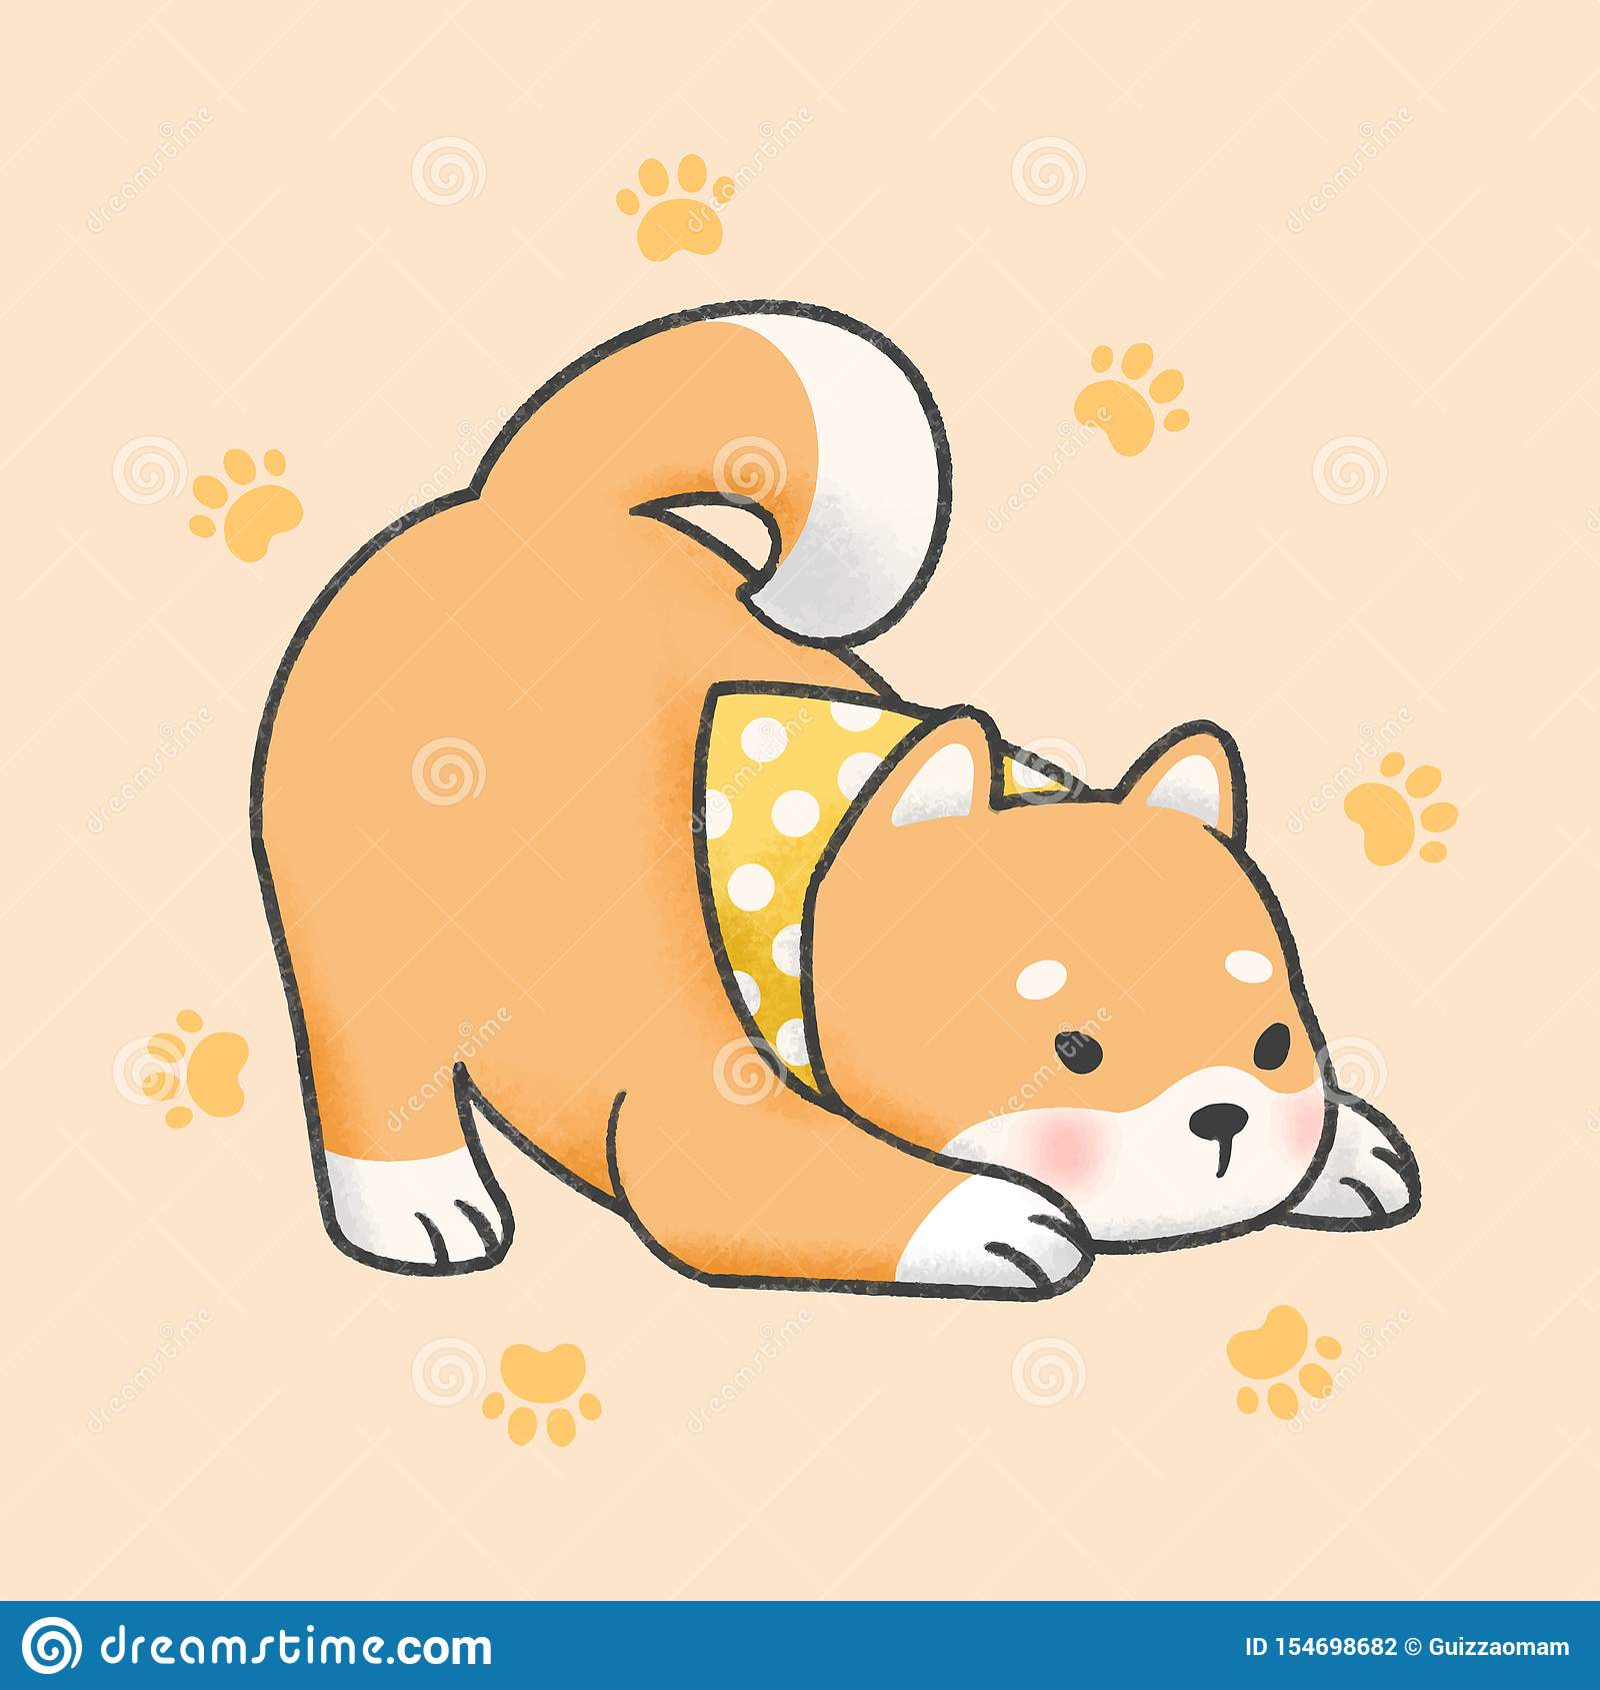 Shiba Inu Dog Cartoon Hand Drawn Style Stock Illustration Illustration Of Love Doodle 154698682